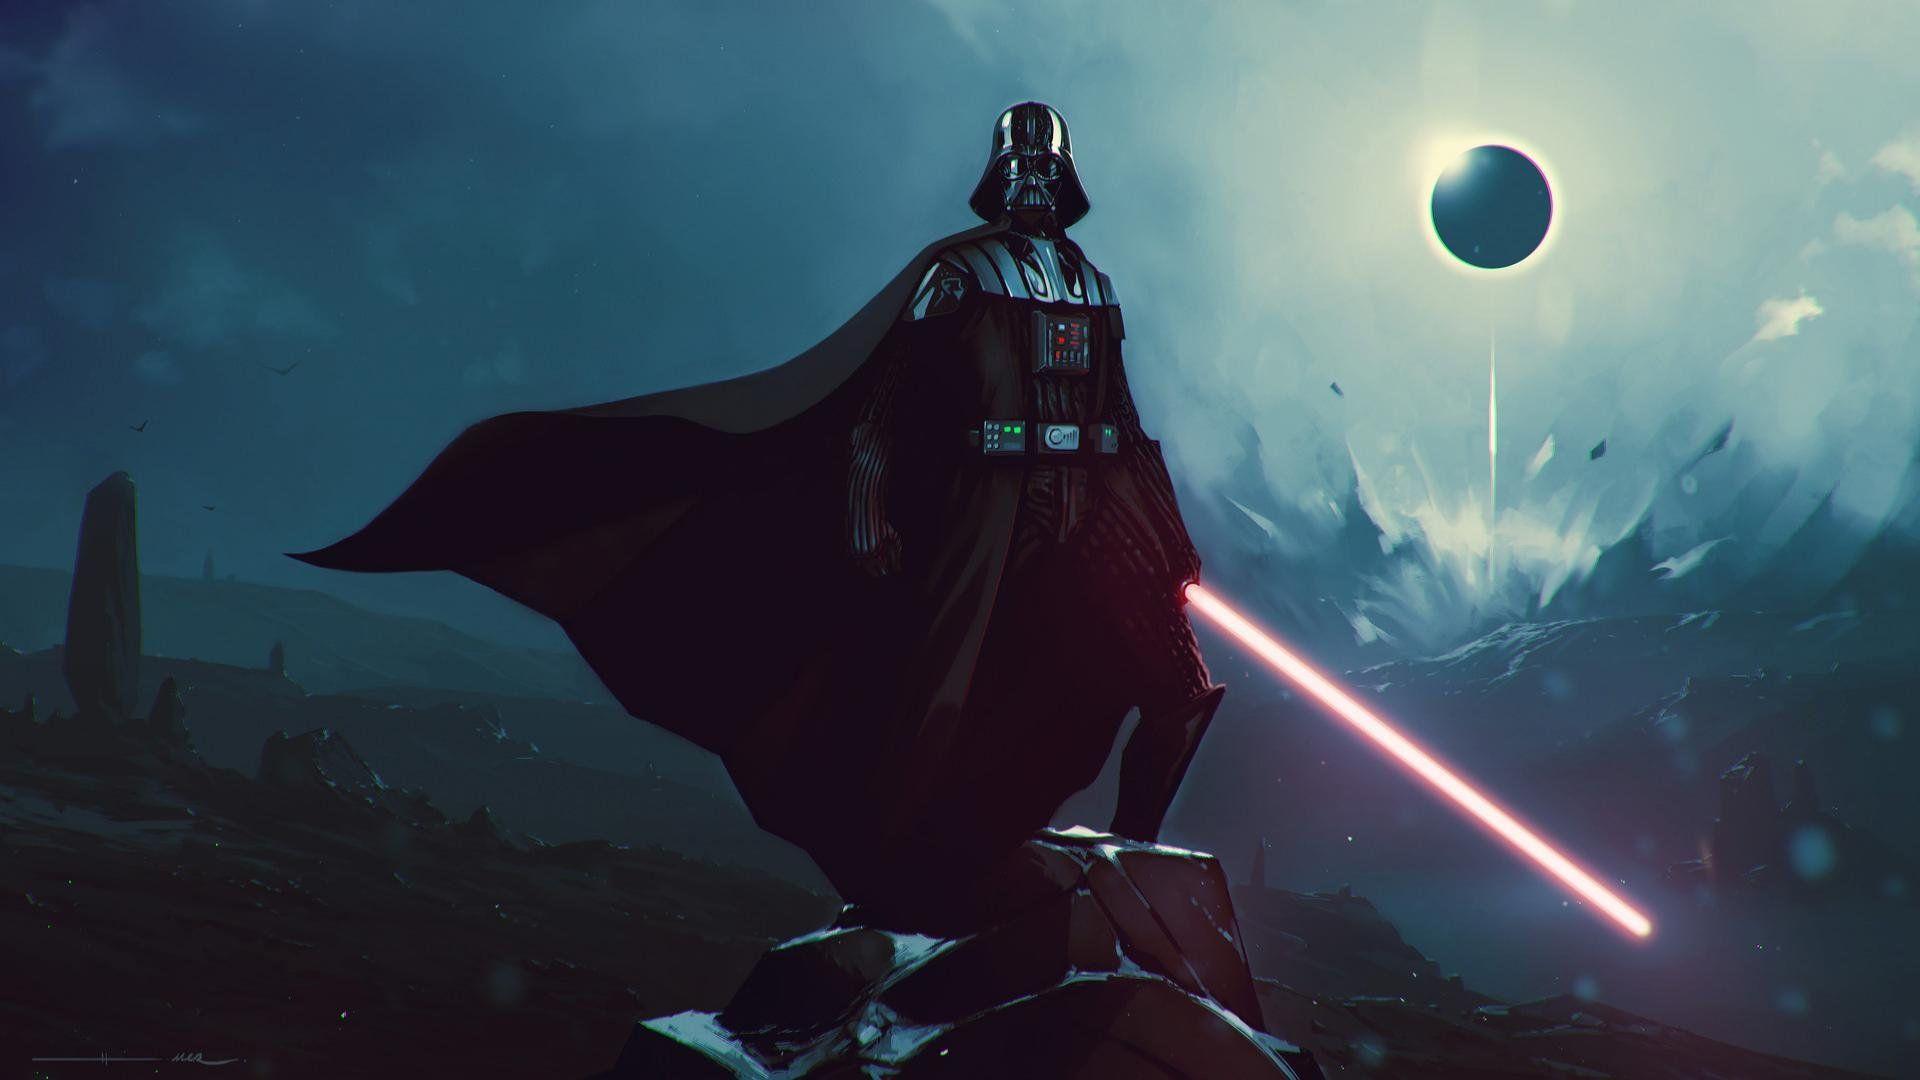 Google Image Result For Https Wallpapermemory Com Uploads 779 Star Wars Background 1080p 45983 In 2020 Star Wars Wallpaper Star Wars Background Darth Vader Wallpaper